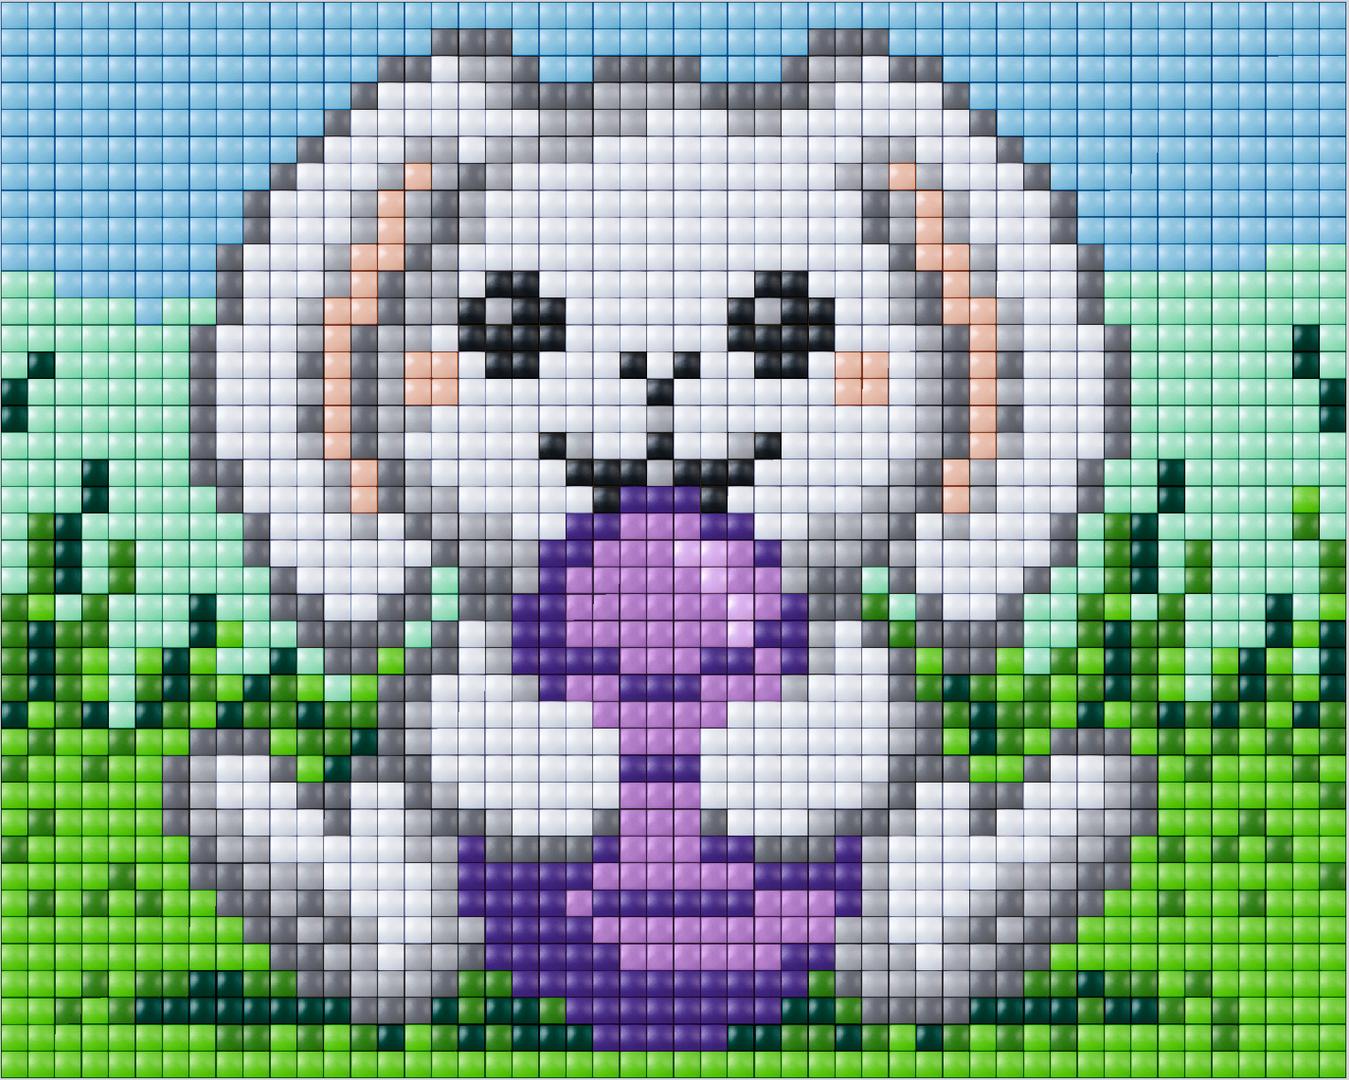 Rabbit_2x2L Pixel XL